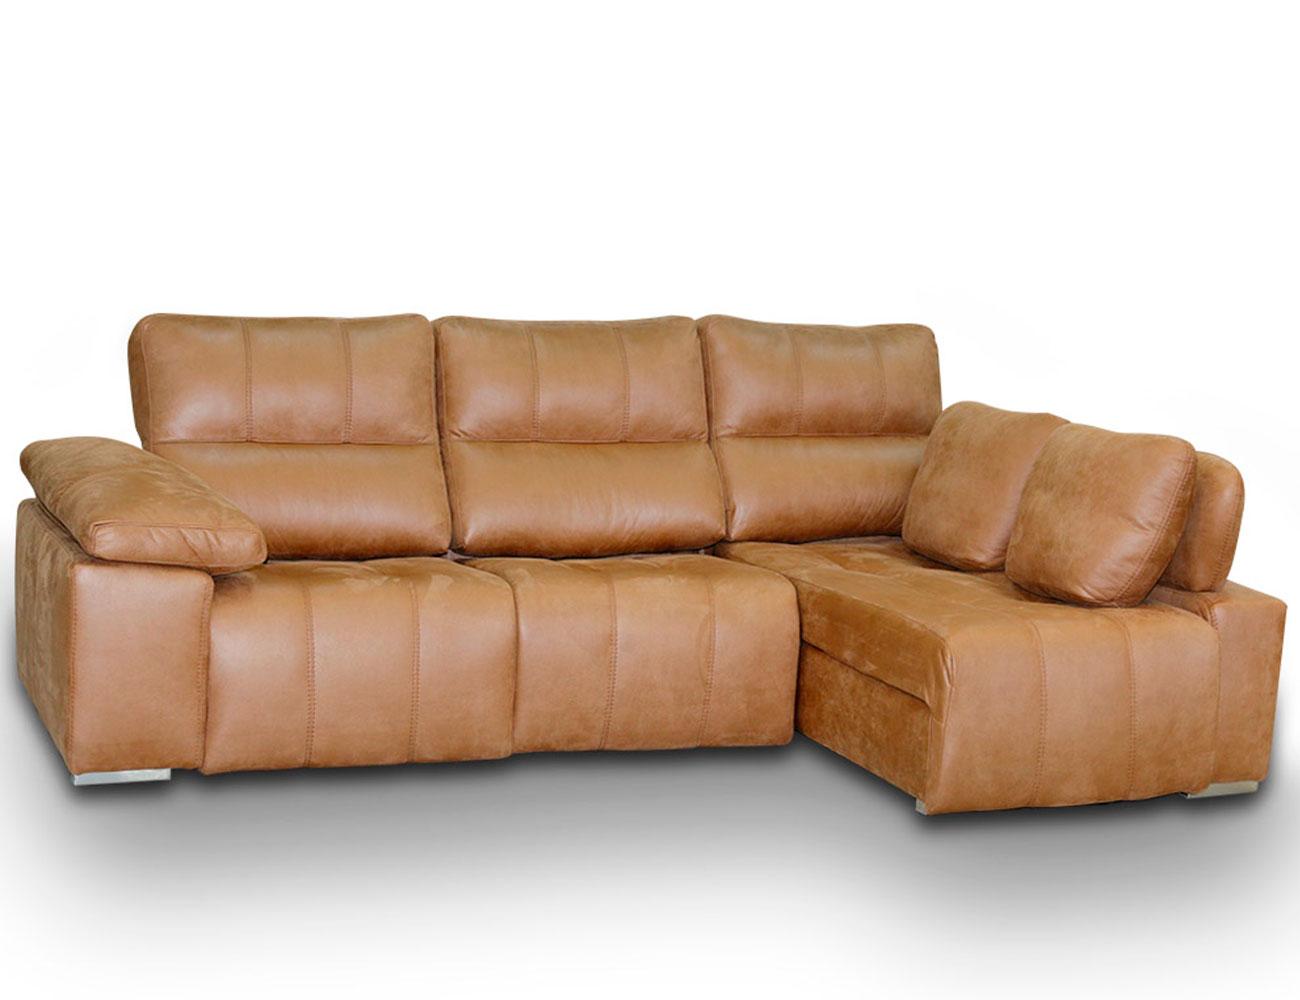 Sofa chaiselongue relax 2 motores anti manchas27